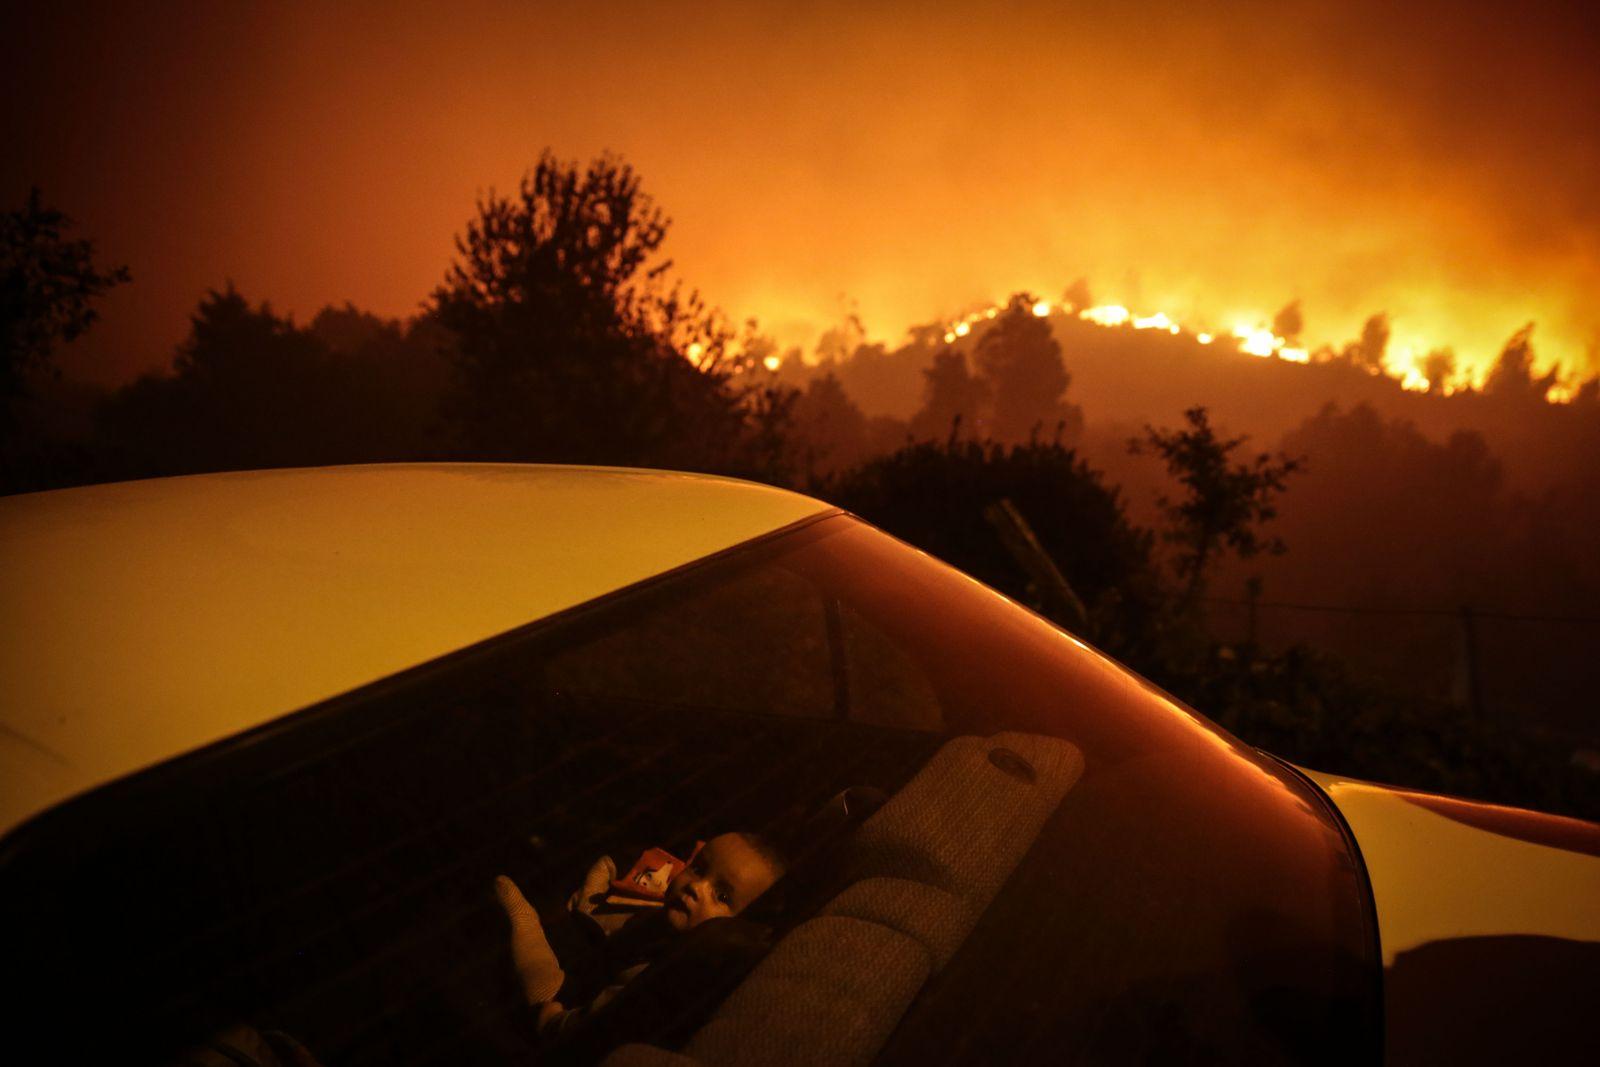 Forest fire in Oliveira de Frades, Portugal - 07 Sep 2020